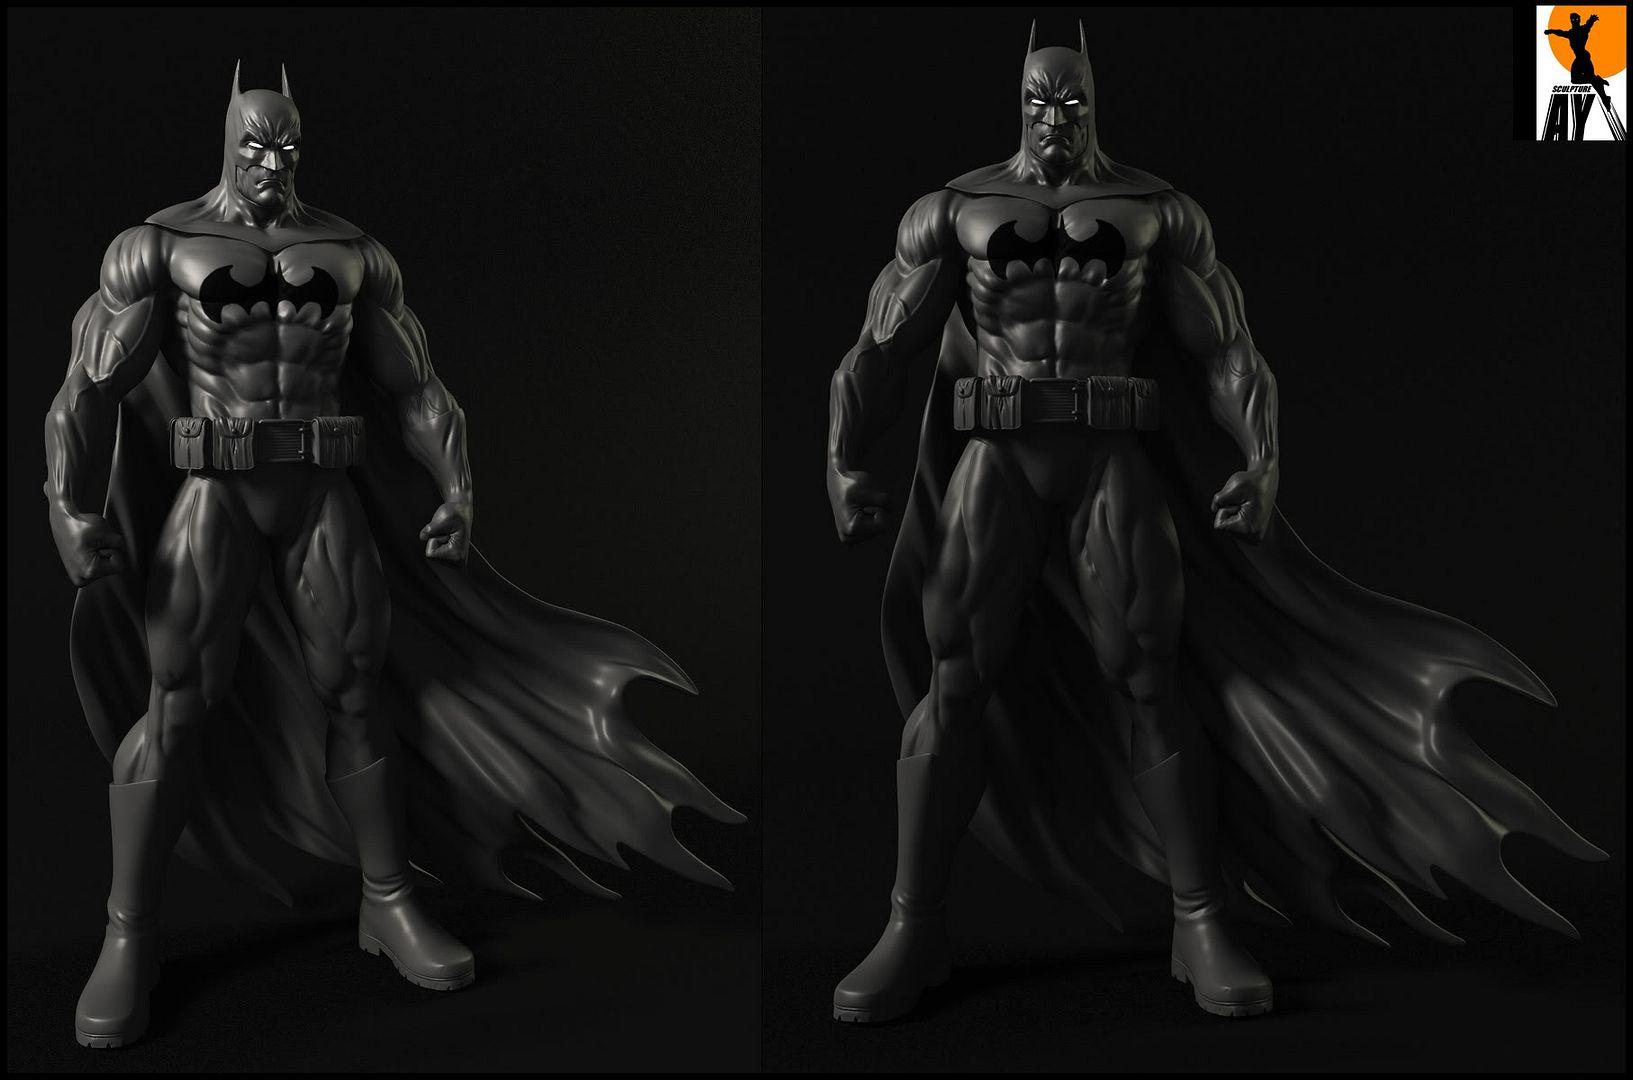 Les travaux de AY sculpture - Page 7 Bats-1